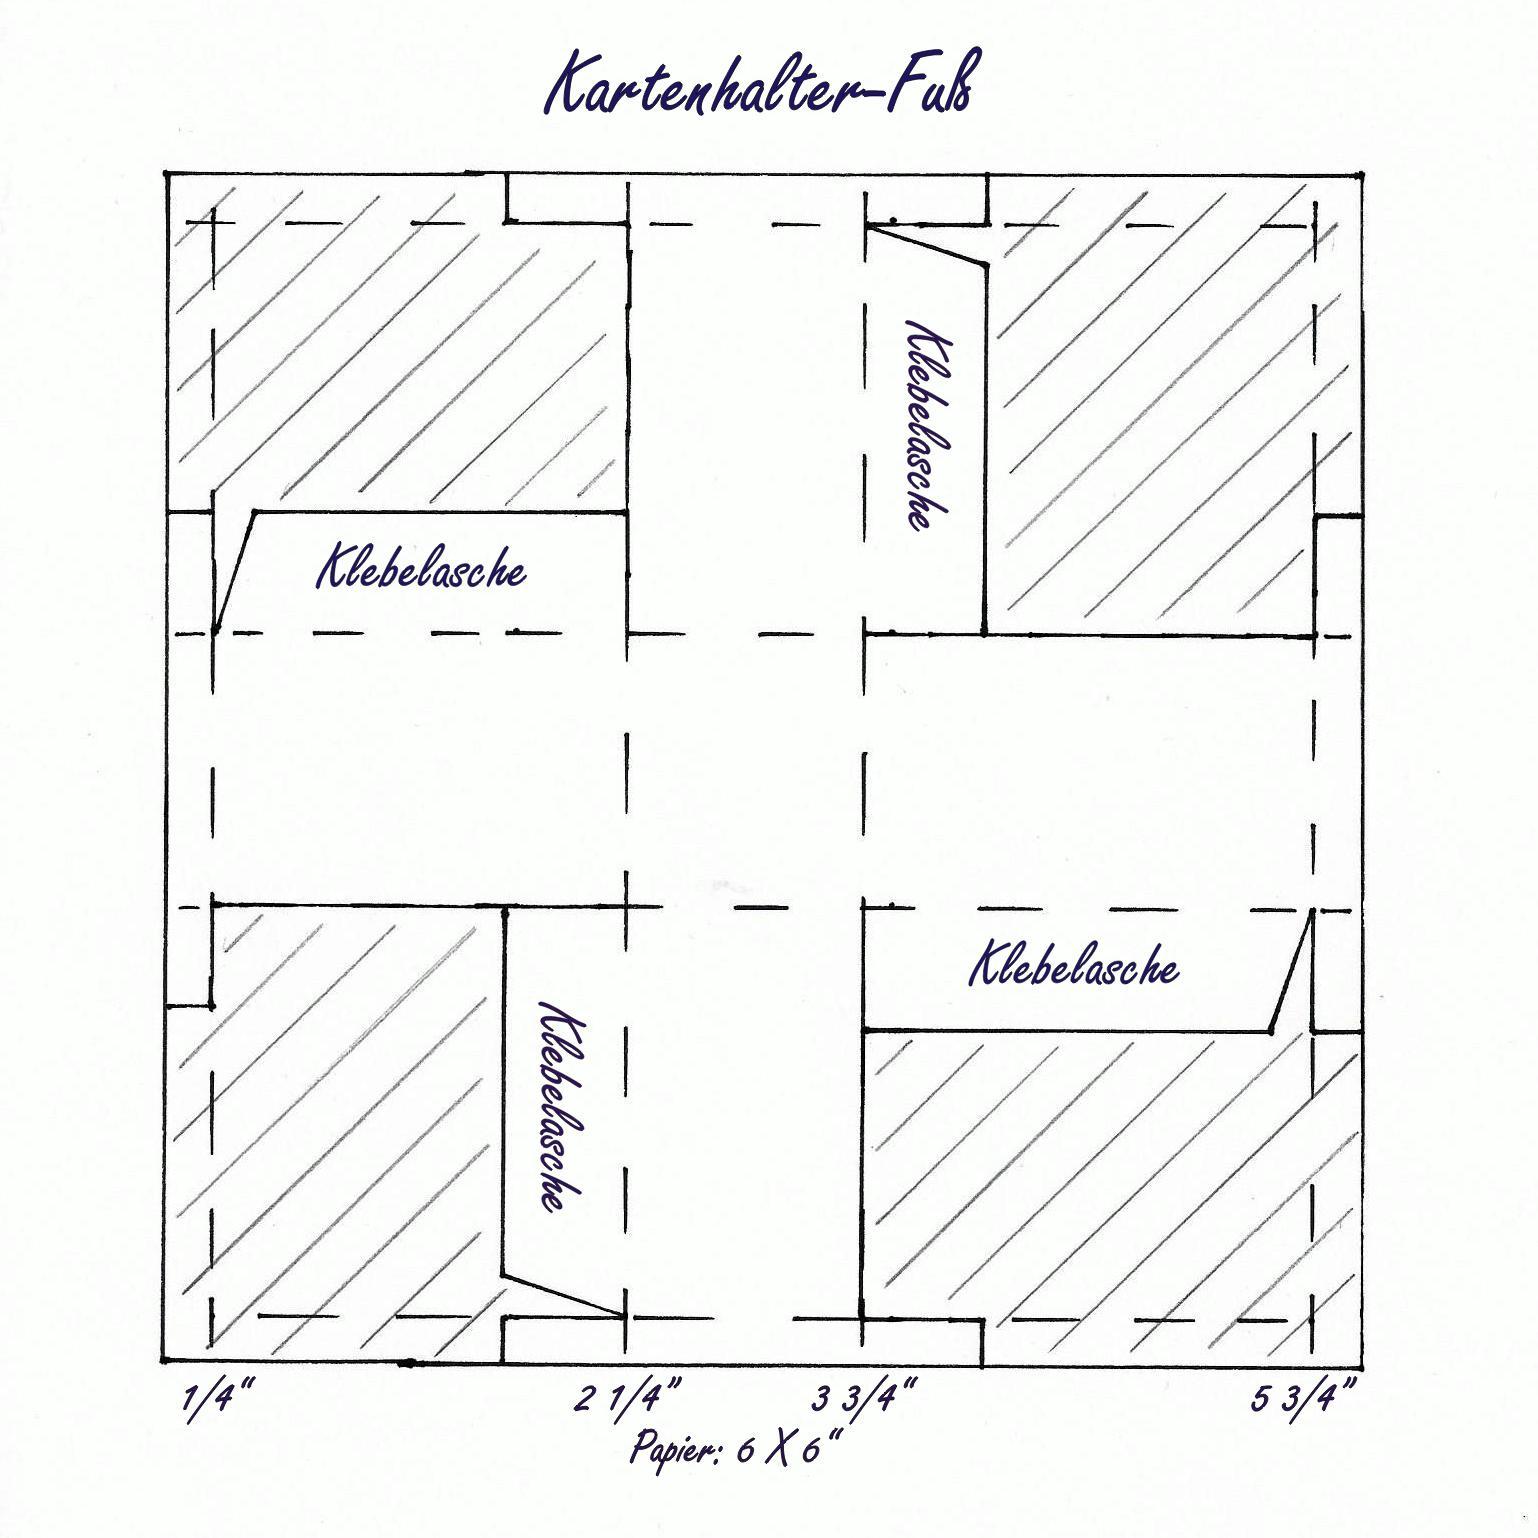 Eri\'s Kreativwerkstatt: Anleitung zum Kartenhalter